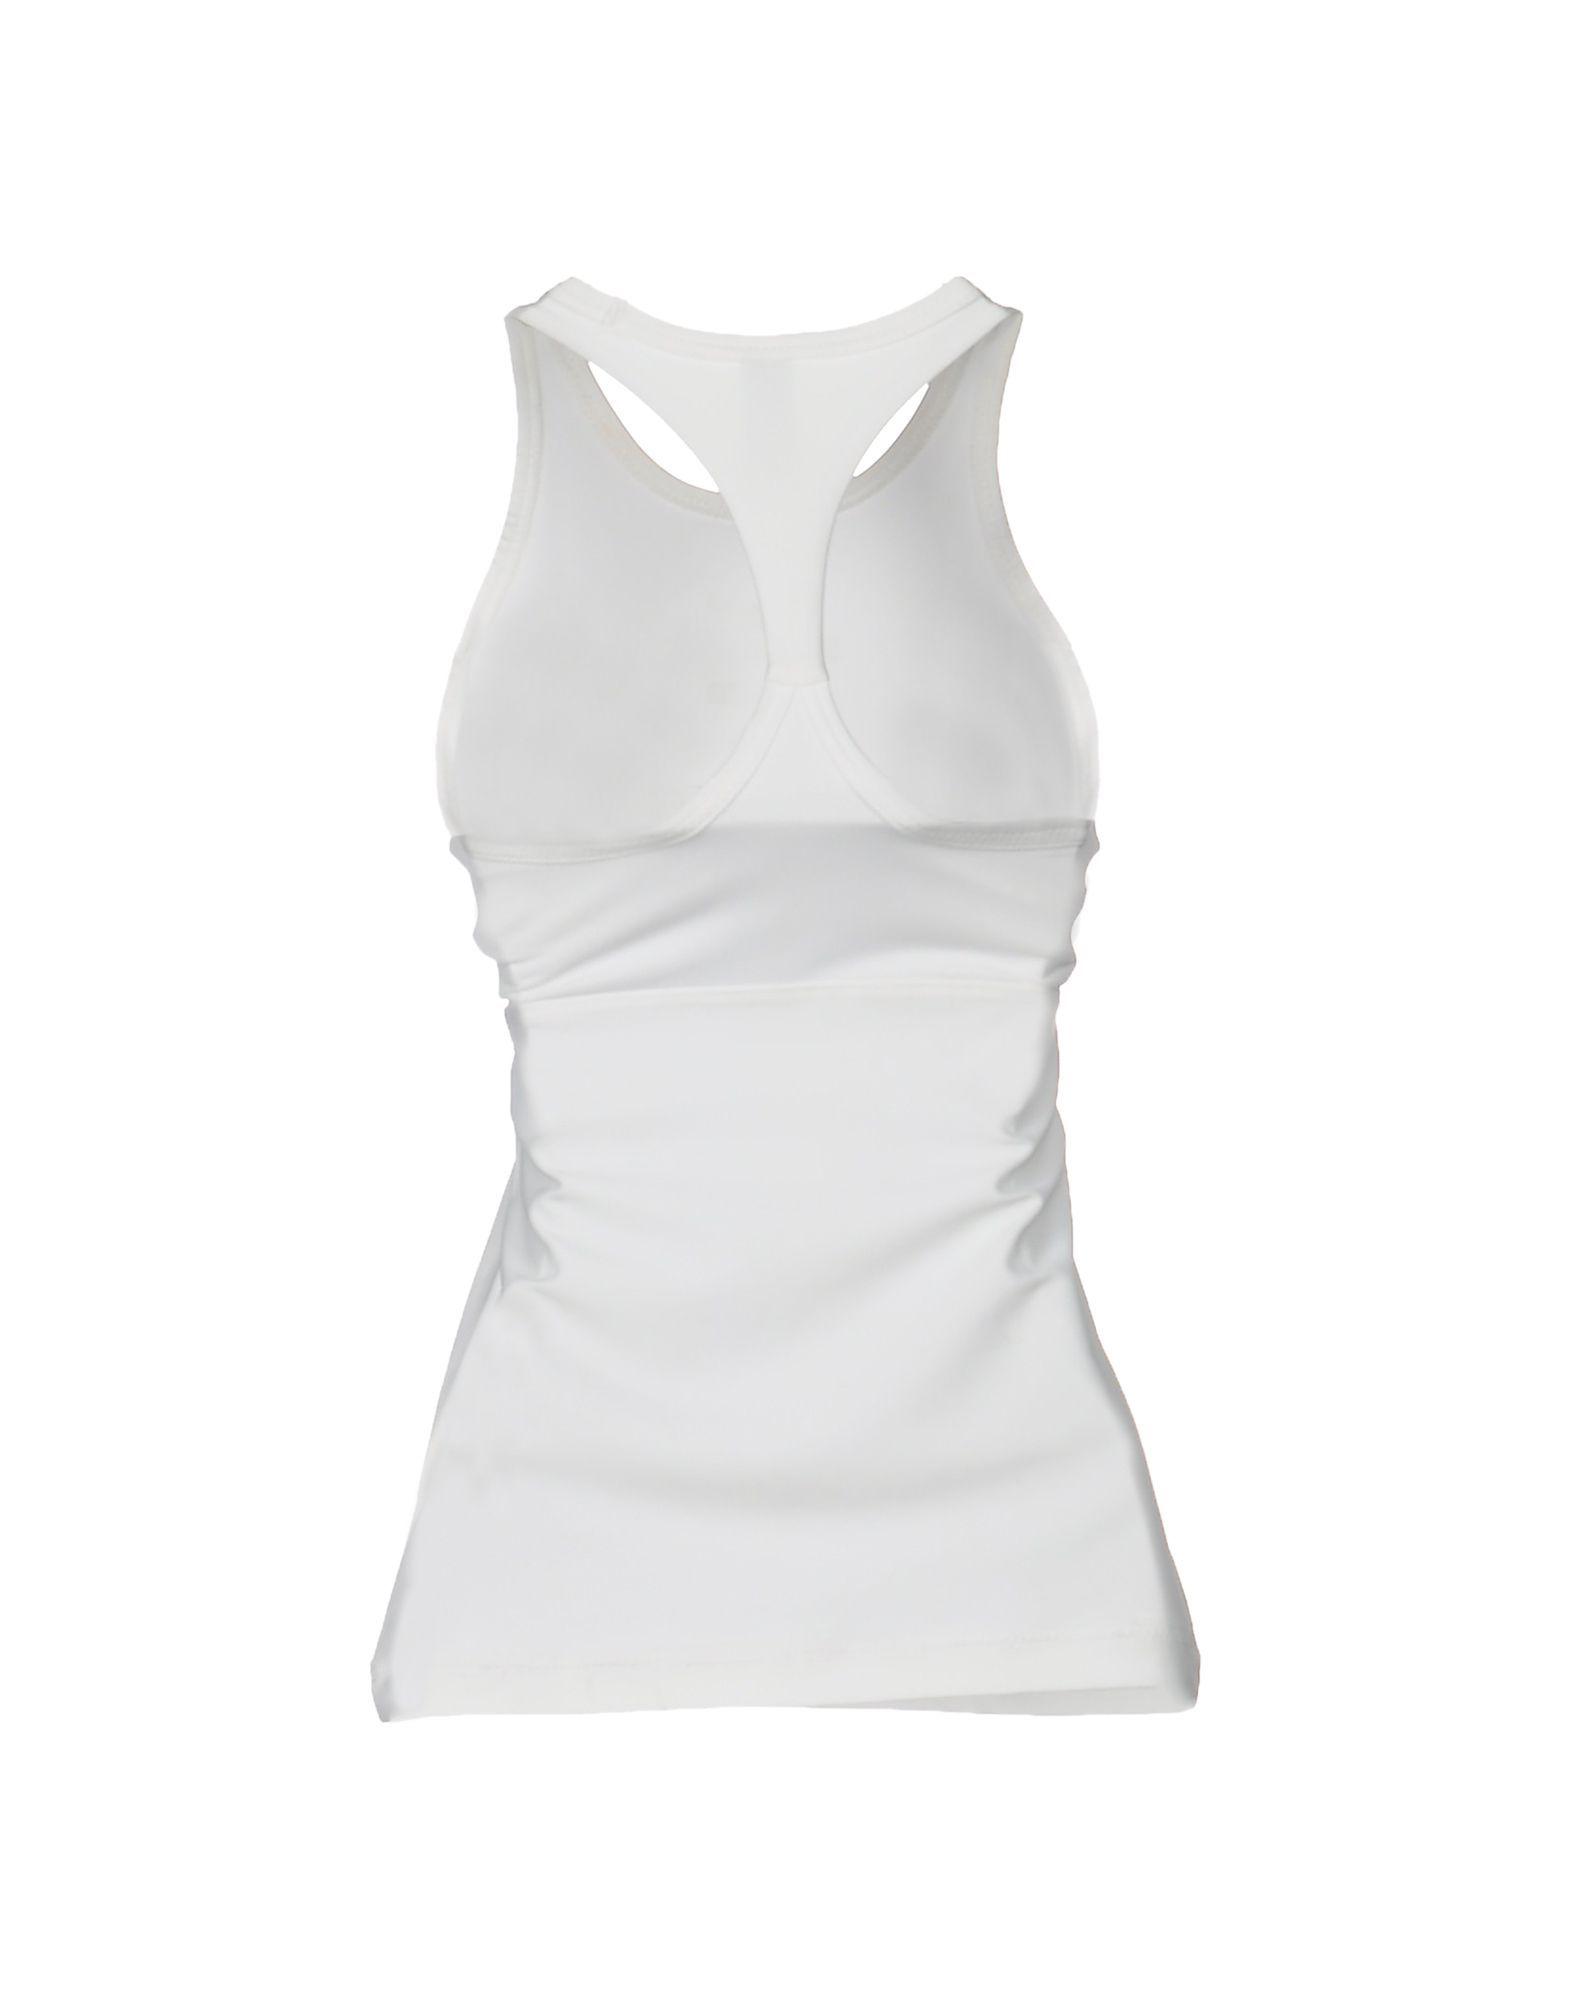 Adidas By Stella McCartney White Tank